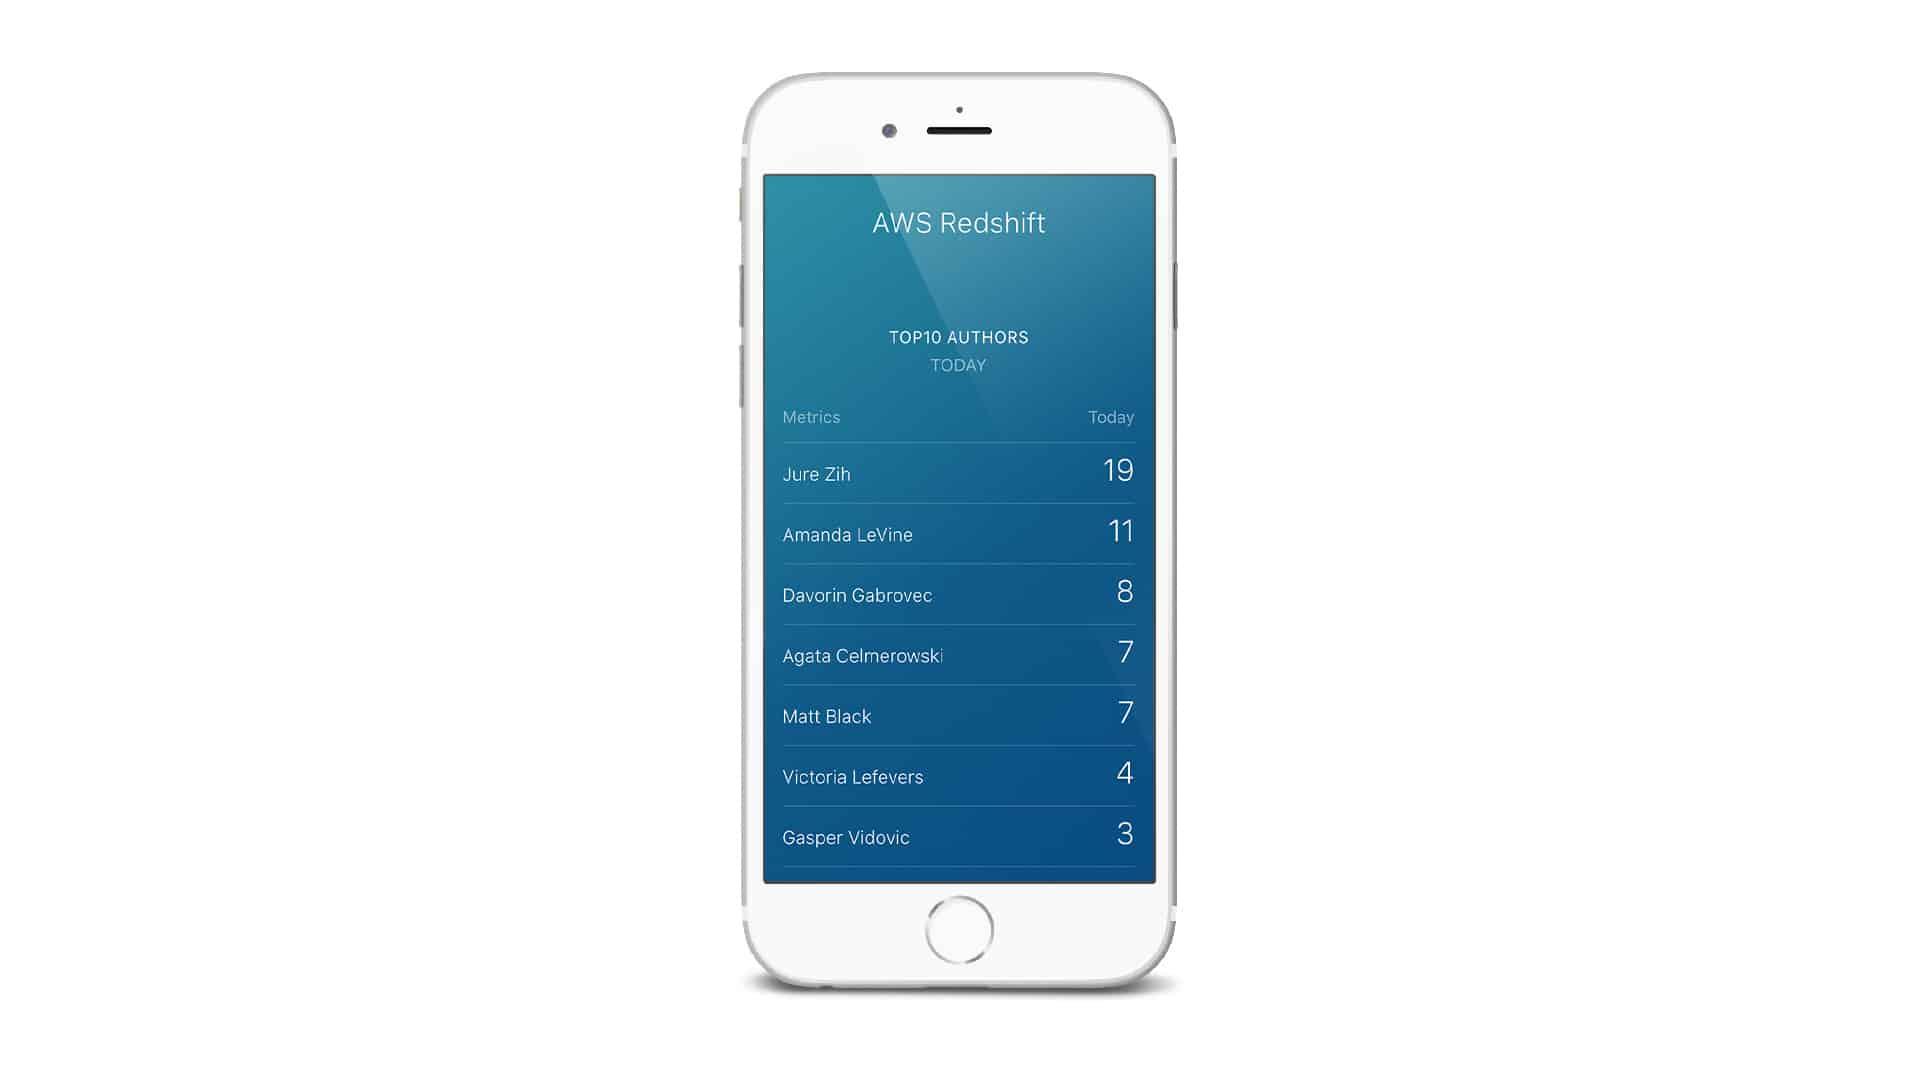 AWS Redshift Mobile Dashboard